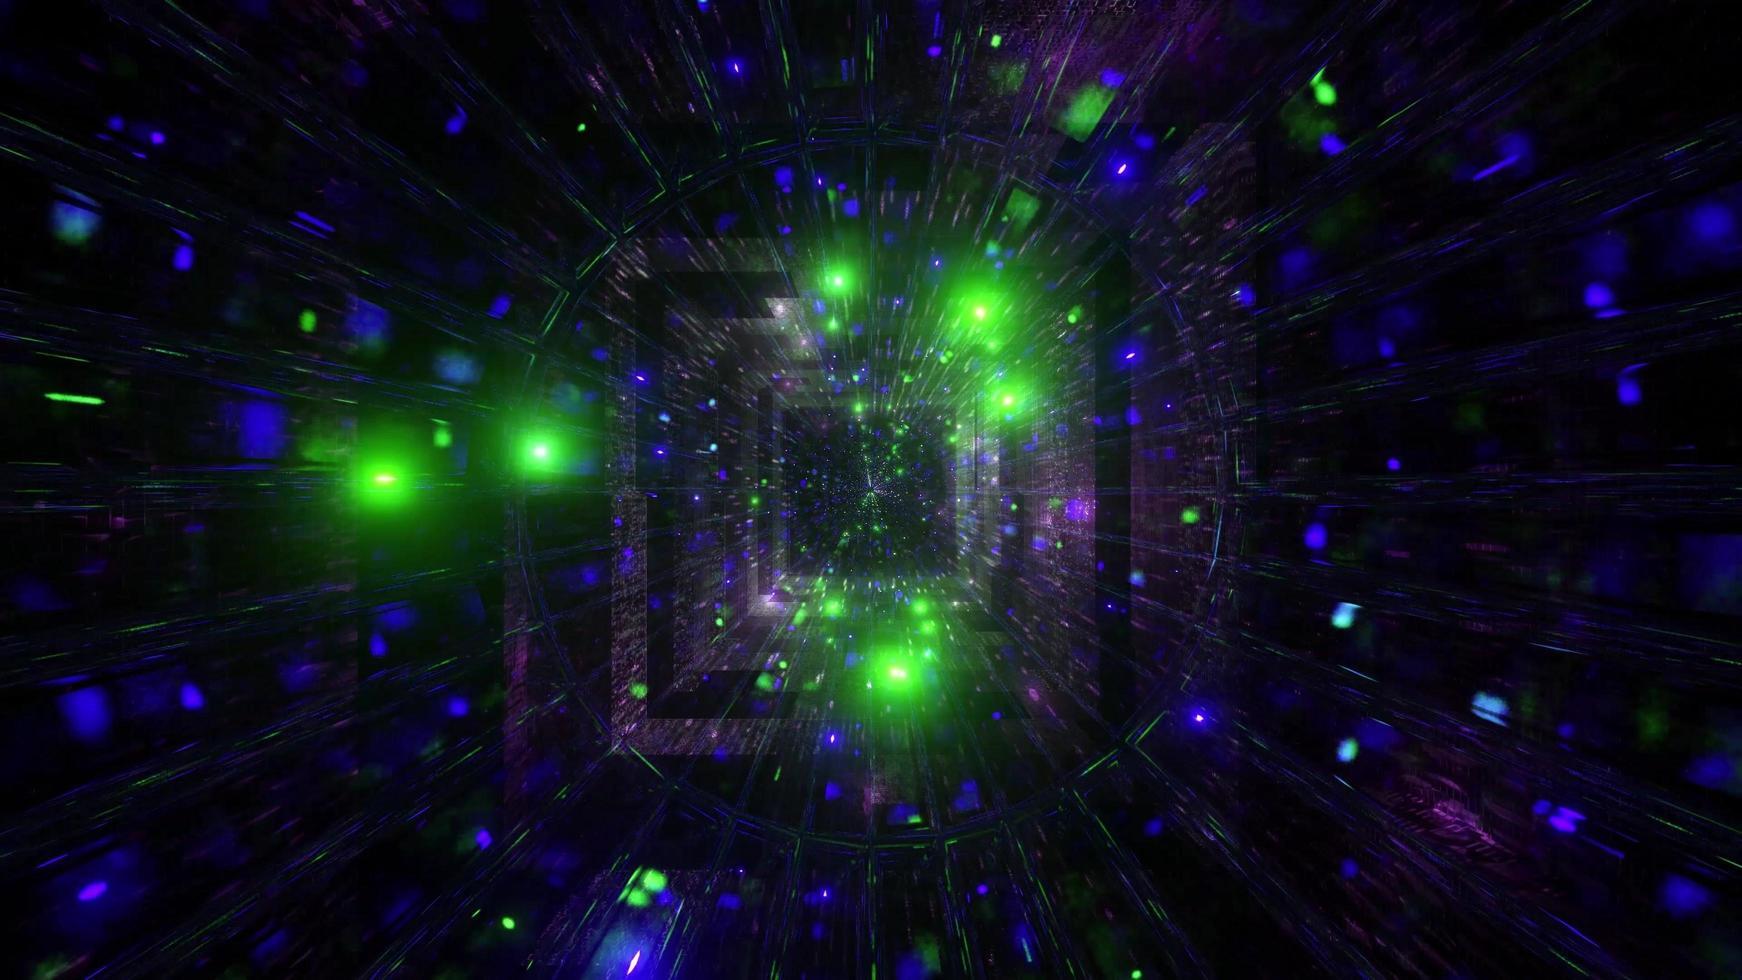 glödande rymdpartiklar sci-fi tunnel 3d illustration bakgrundsbild foto